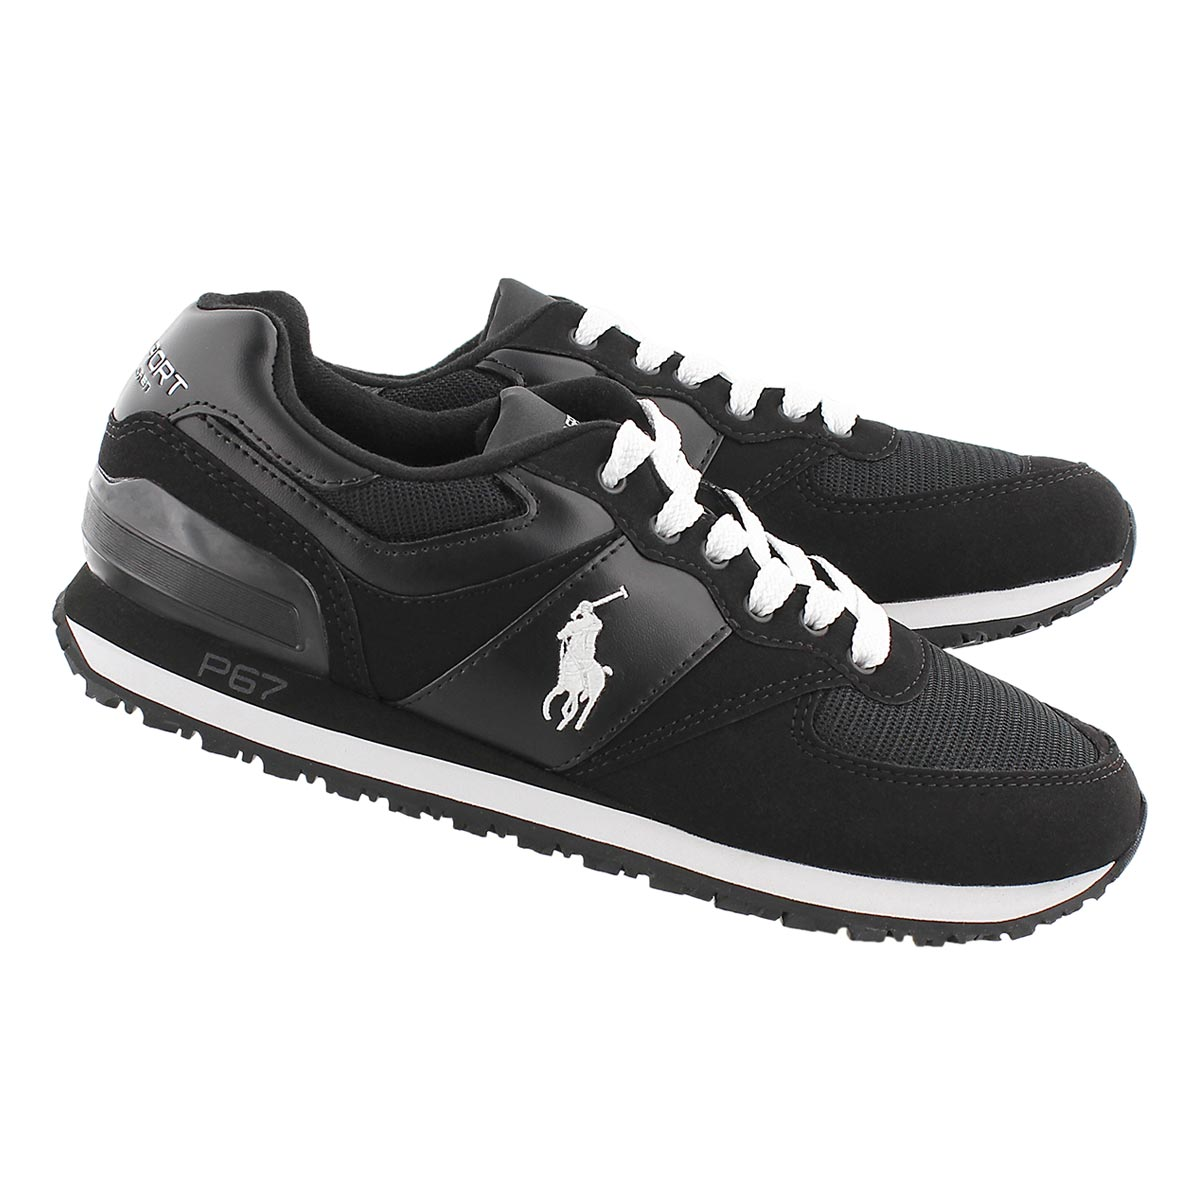 Mns Slaton Pony blk/wht lace up sneaker